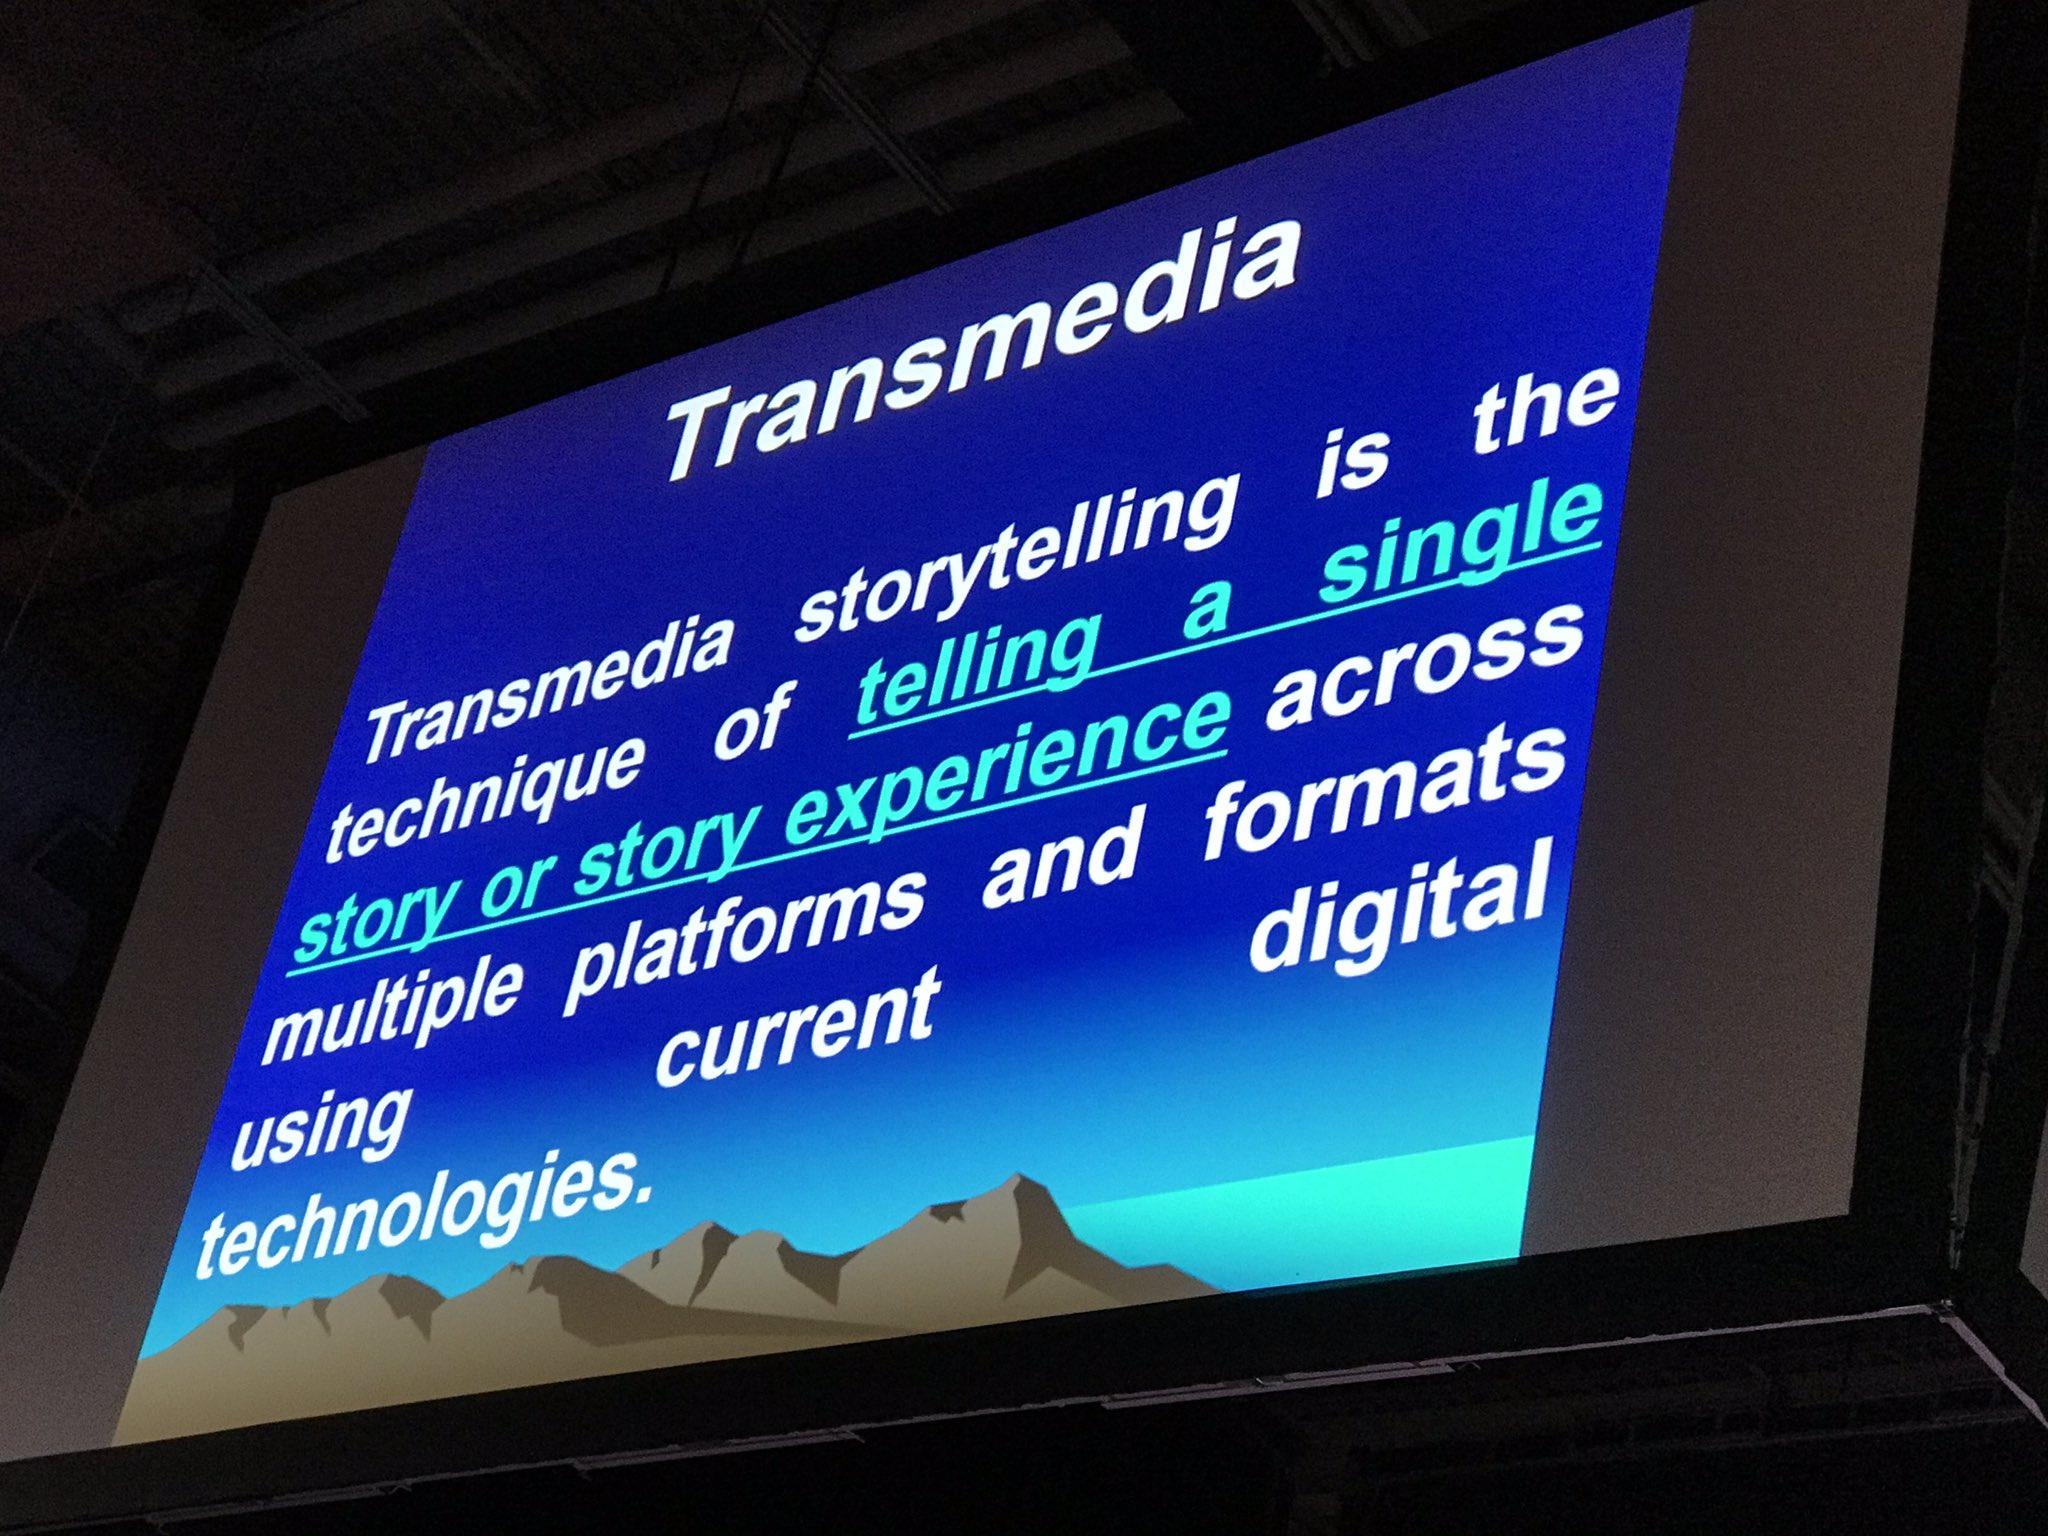 Telling a story through multiple platforms = #transmedia -Don Marinelli #keynote #NYSCATE19 https://t.co/0LAea4vK77